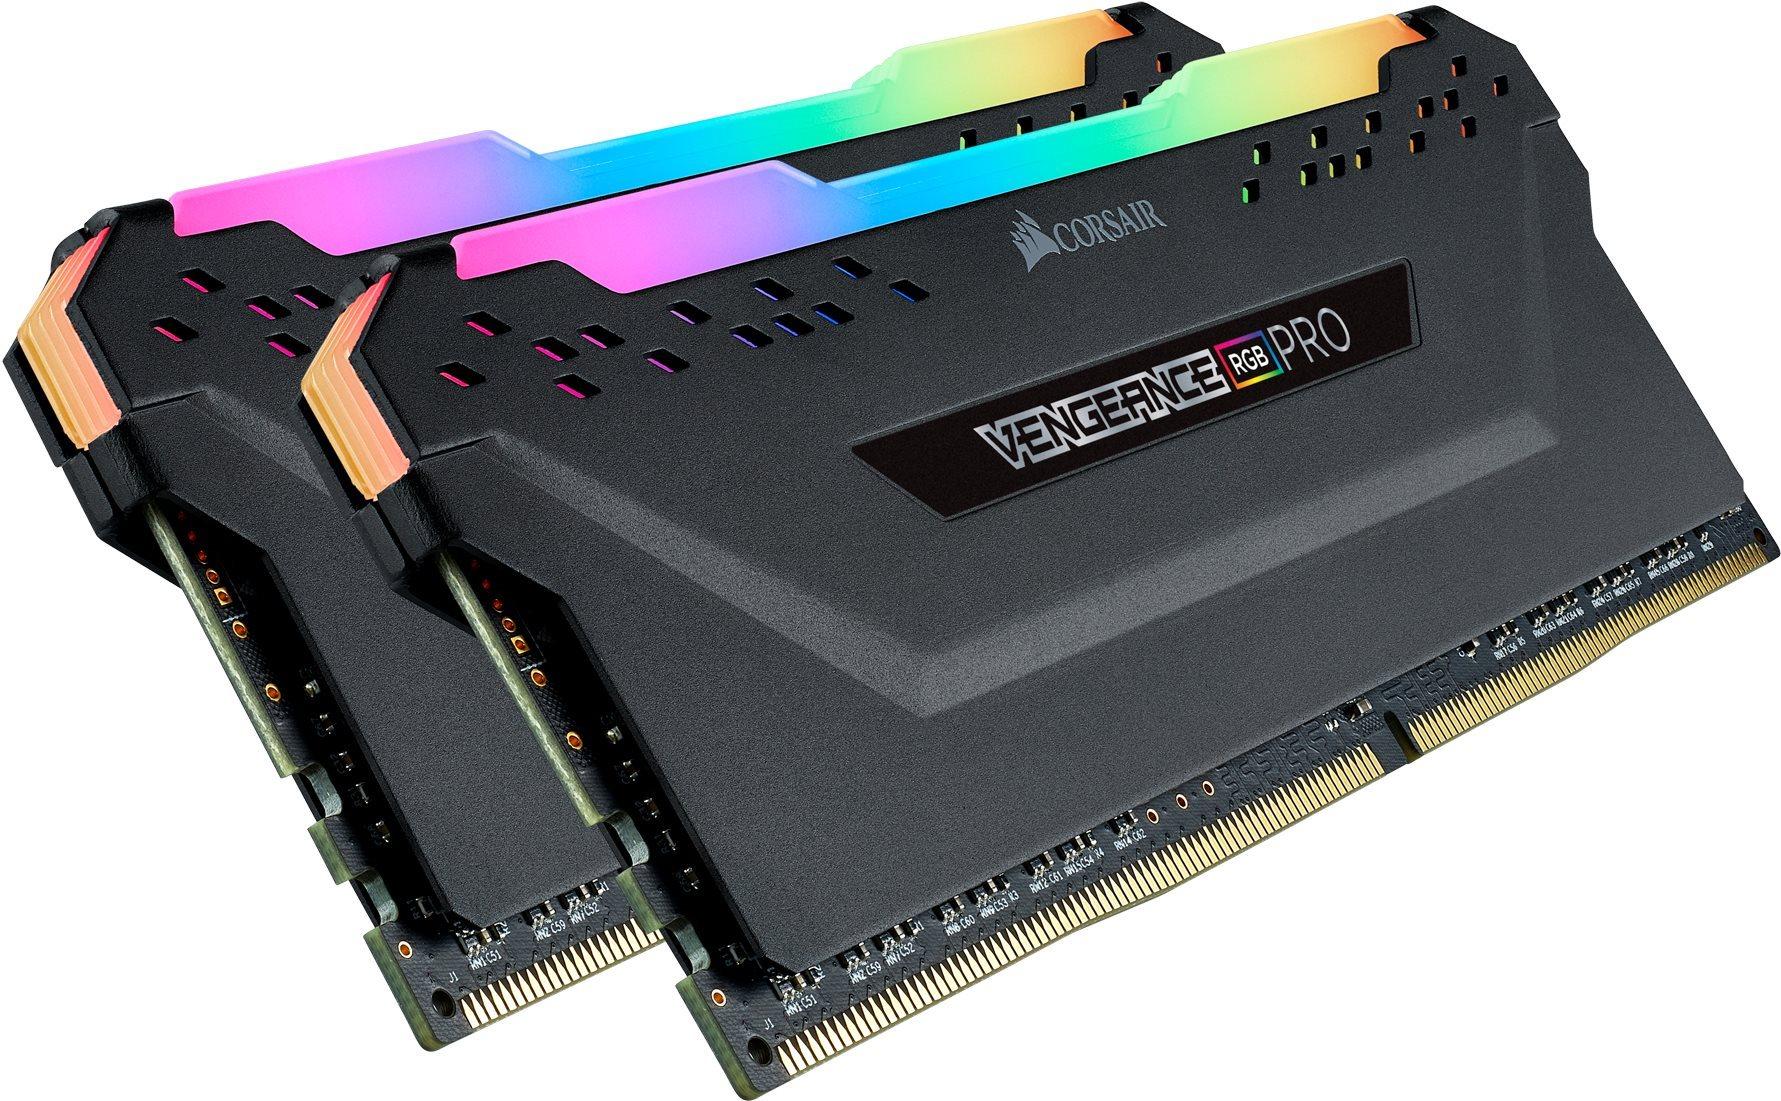 Corsair 64GB KIT DDR4 3600MHz CL18 Vengeance